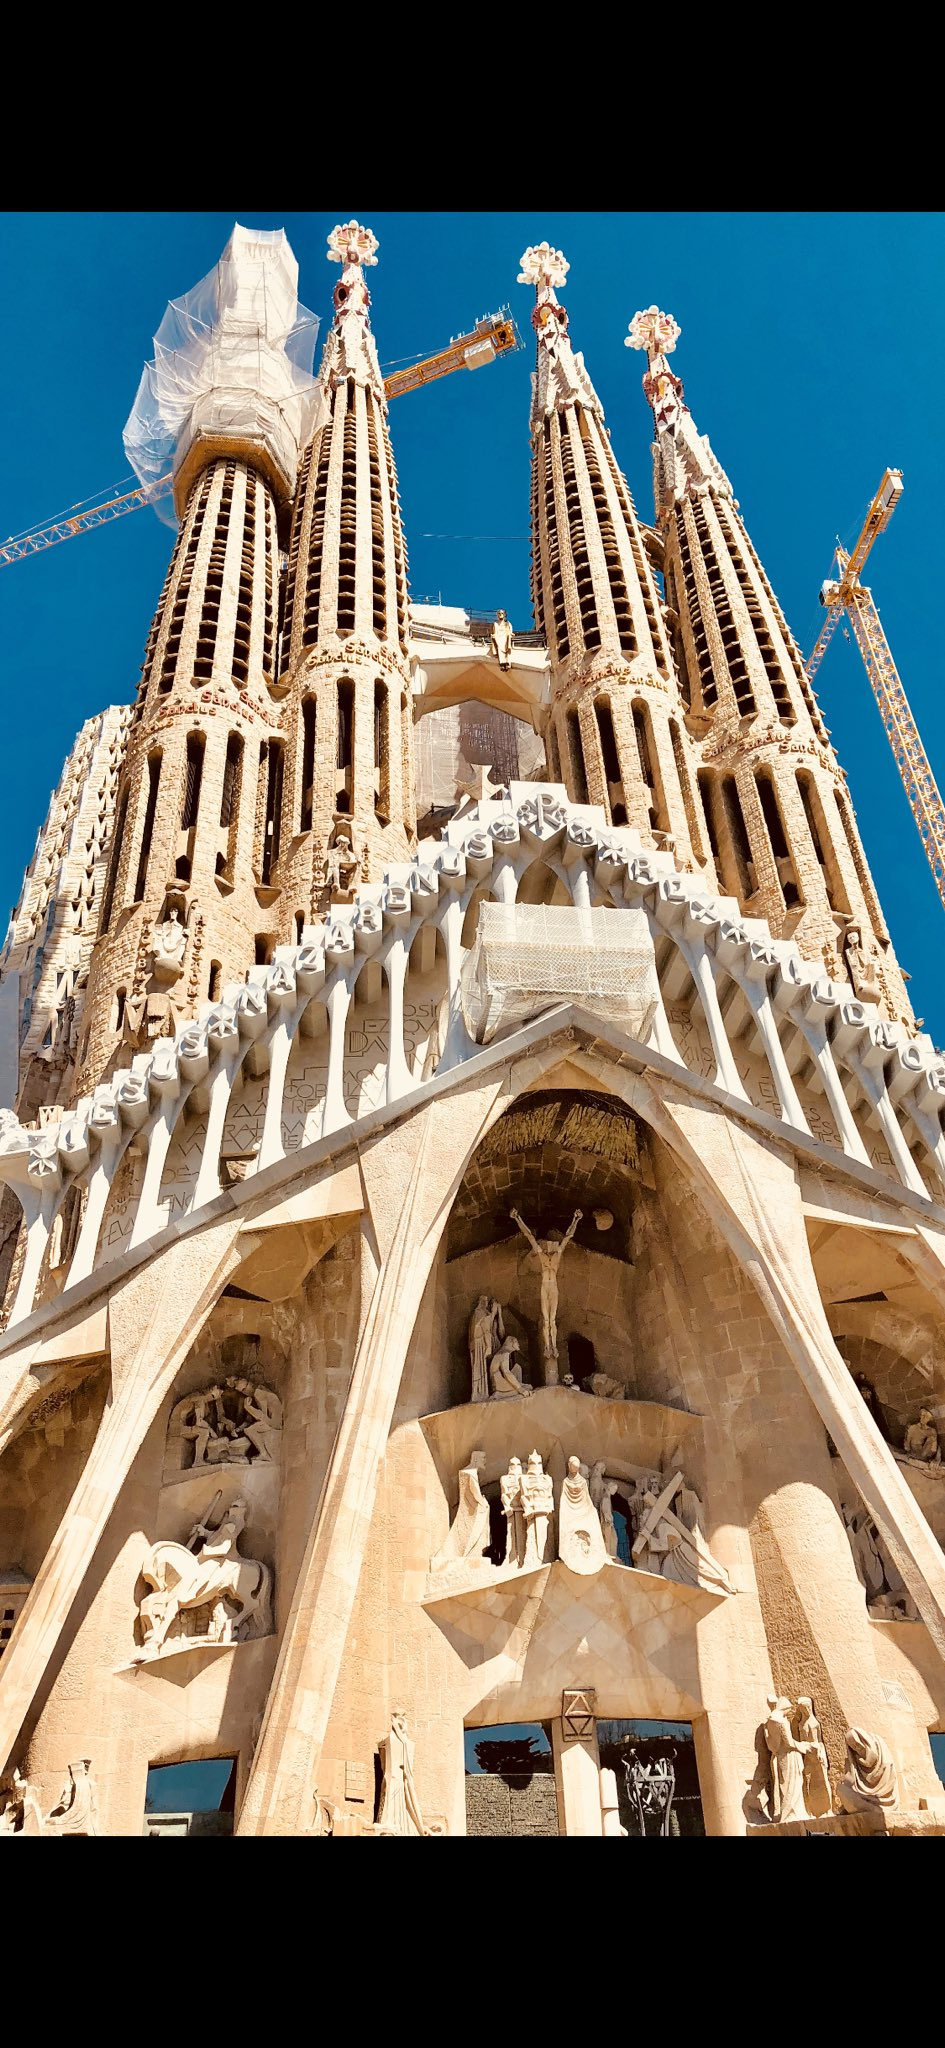 #Spain #Barcelona ゚ヌᆰ゚ヌᄌ゚ヌᆰ゚ヌᄌ゚ヌᆰ゚ヌᄌ゚ヌᆰ゚ヌᄌ #TagATRAVELER ゚フポフポフホ #Gucci ゚ムプマᄒ https://t.co/m77WpkuL7X